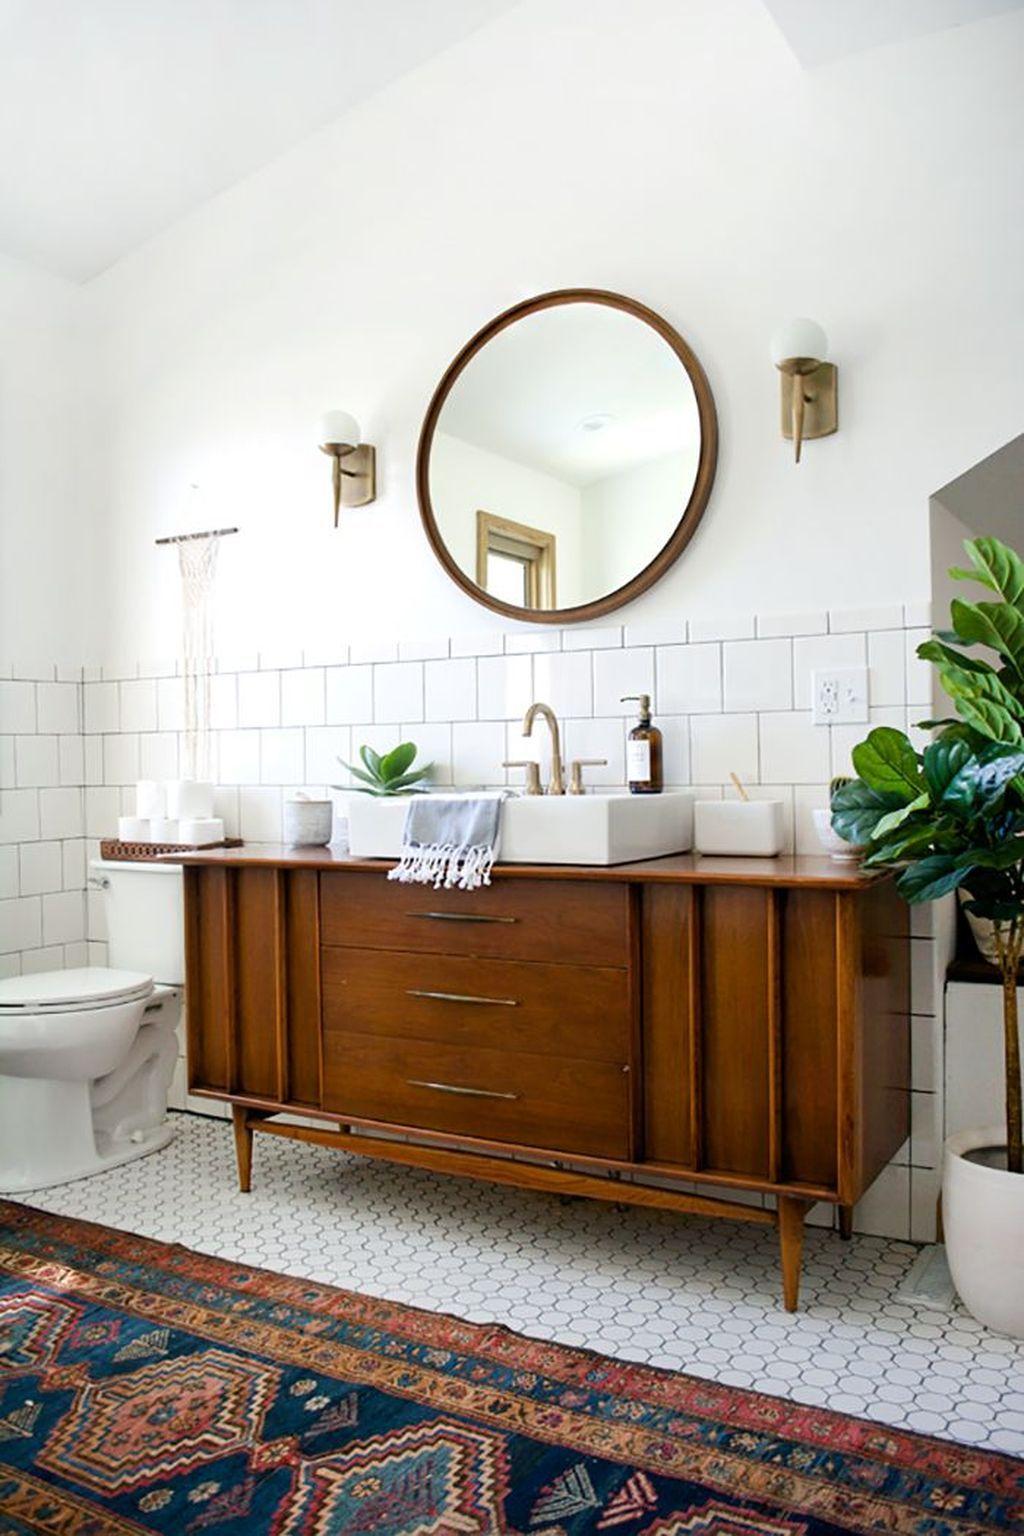 37 Vintage Farmhouse Bathroom Remodel Ideas On A Budget With